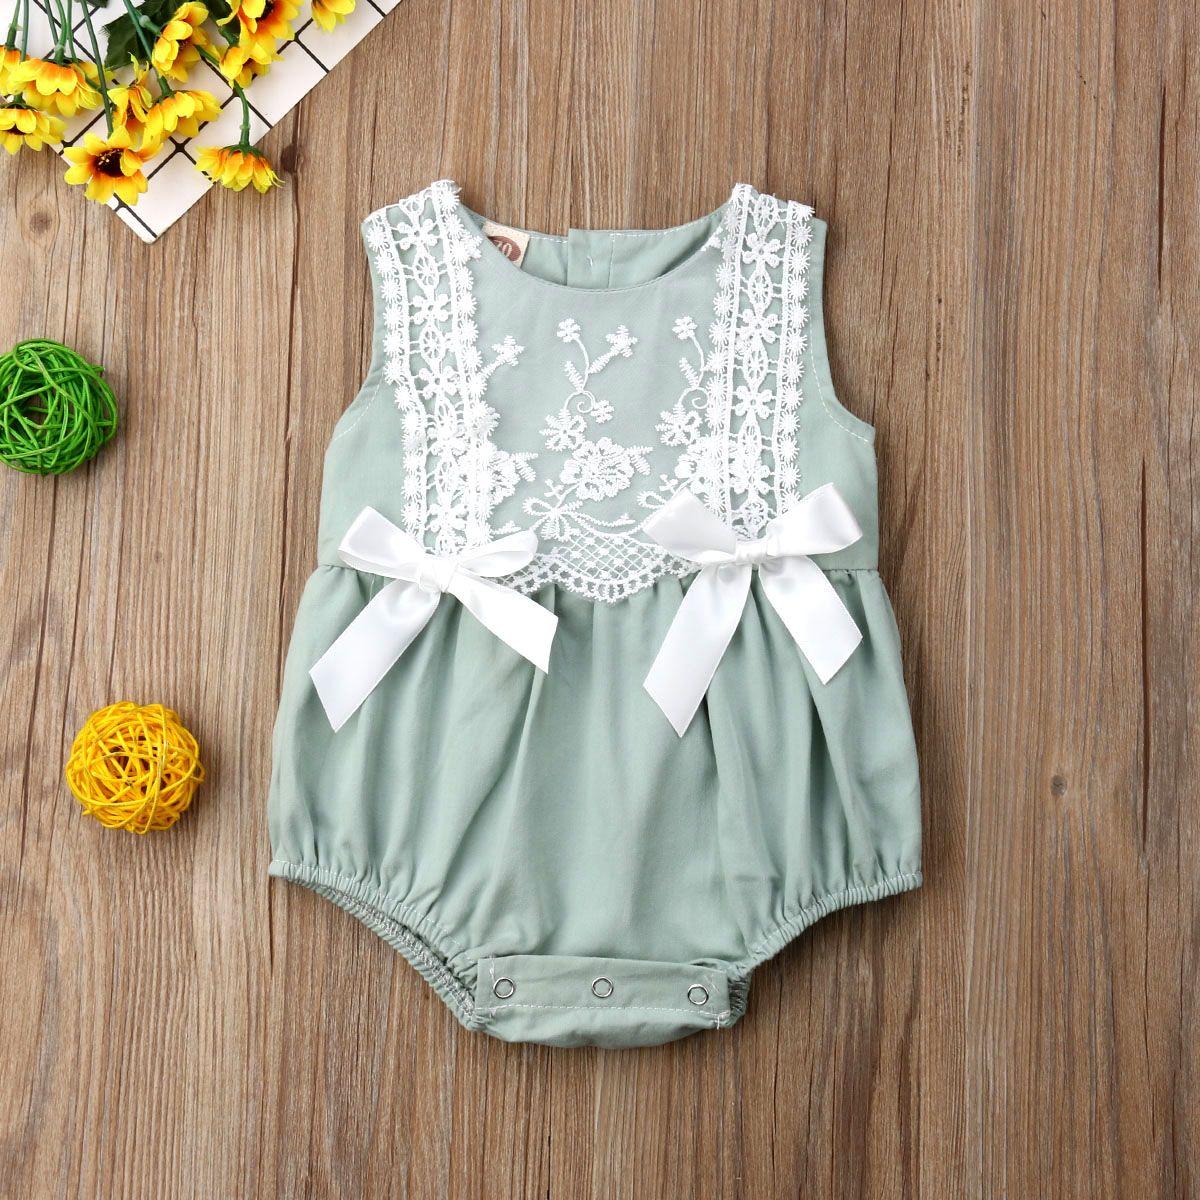 bed2b913d17 Online Shop 2019 New Infant Newborn Baby Girls Clothing Lace Ruffles  Rompers Jumpsuit Cute Bow Sunsuit